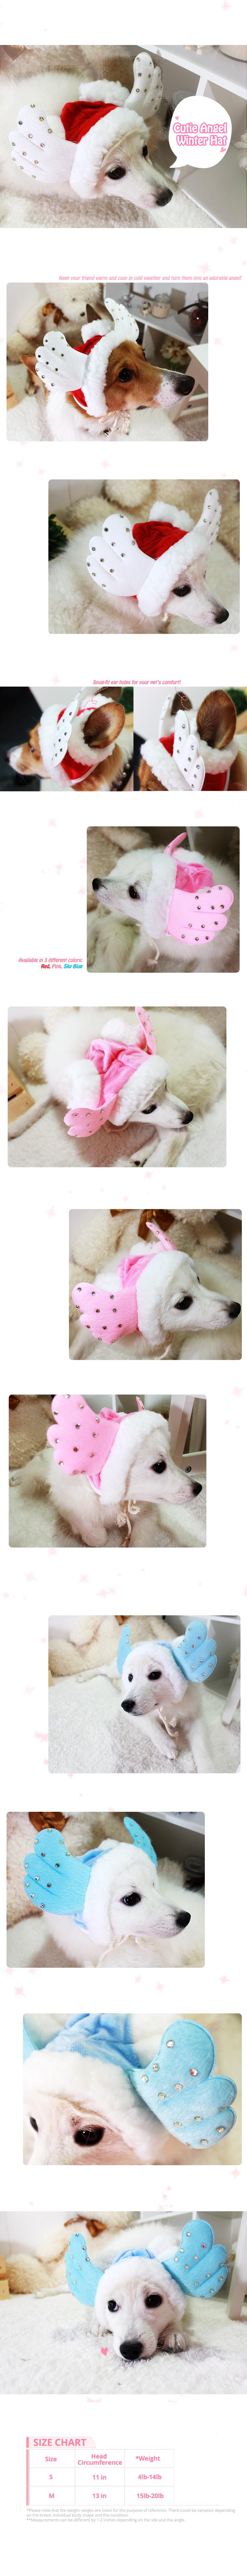 cutie-angel-winter-hat.png